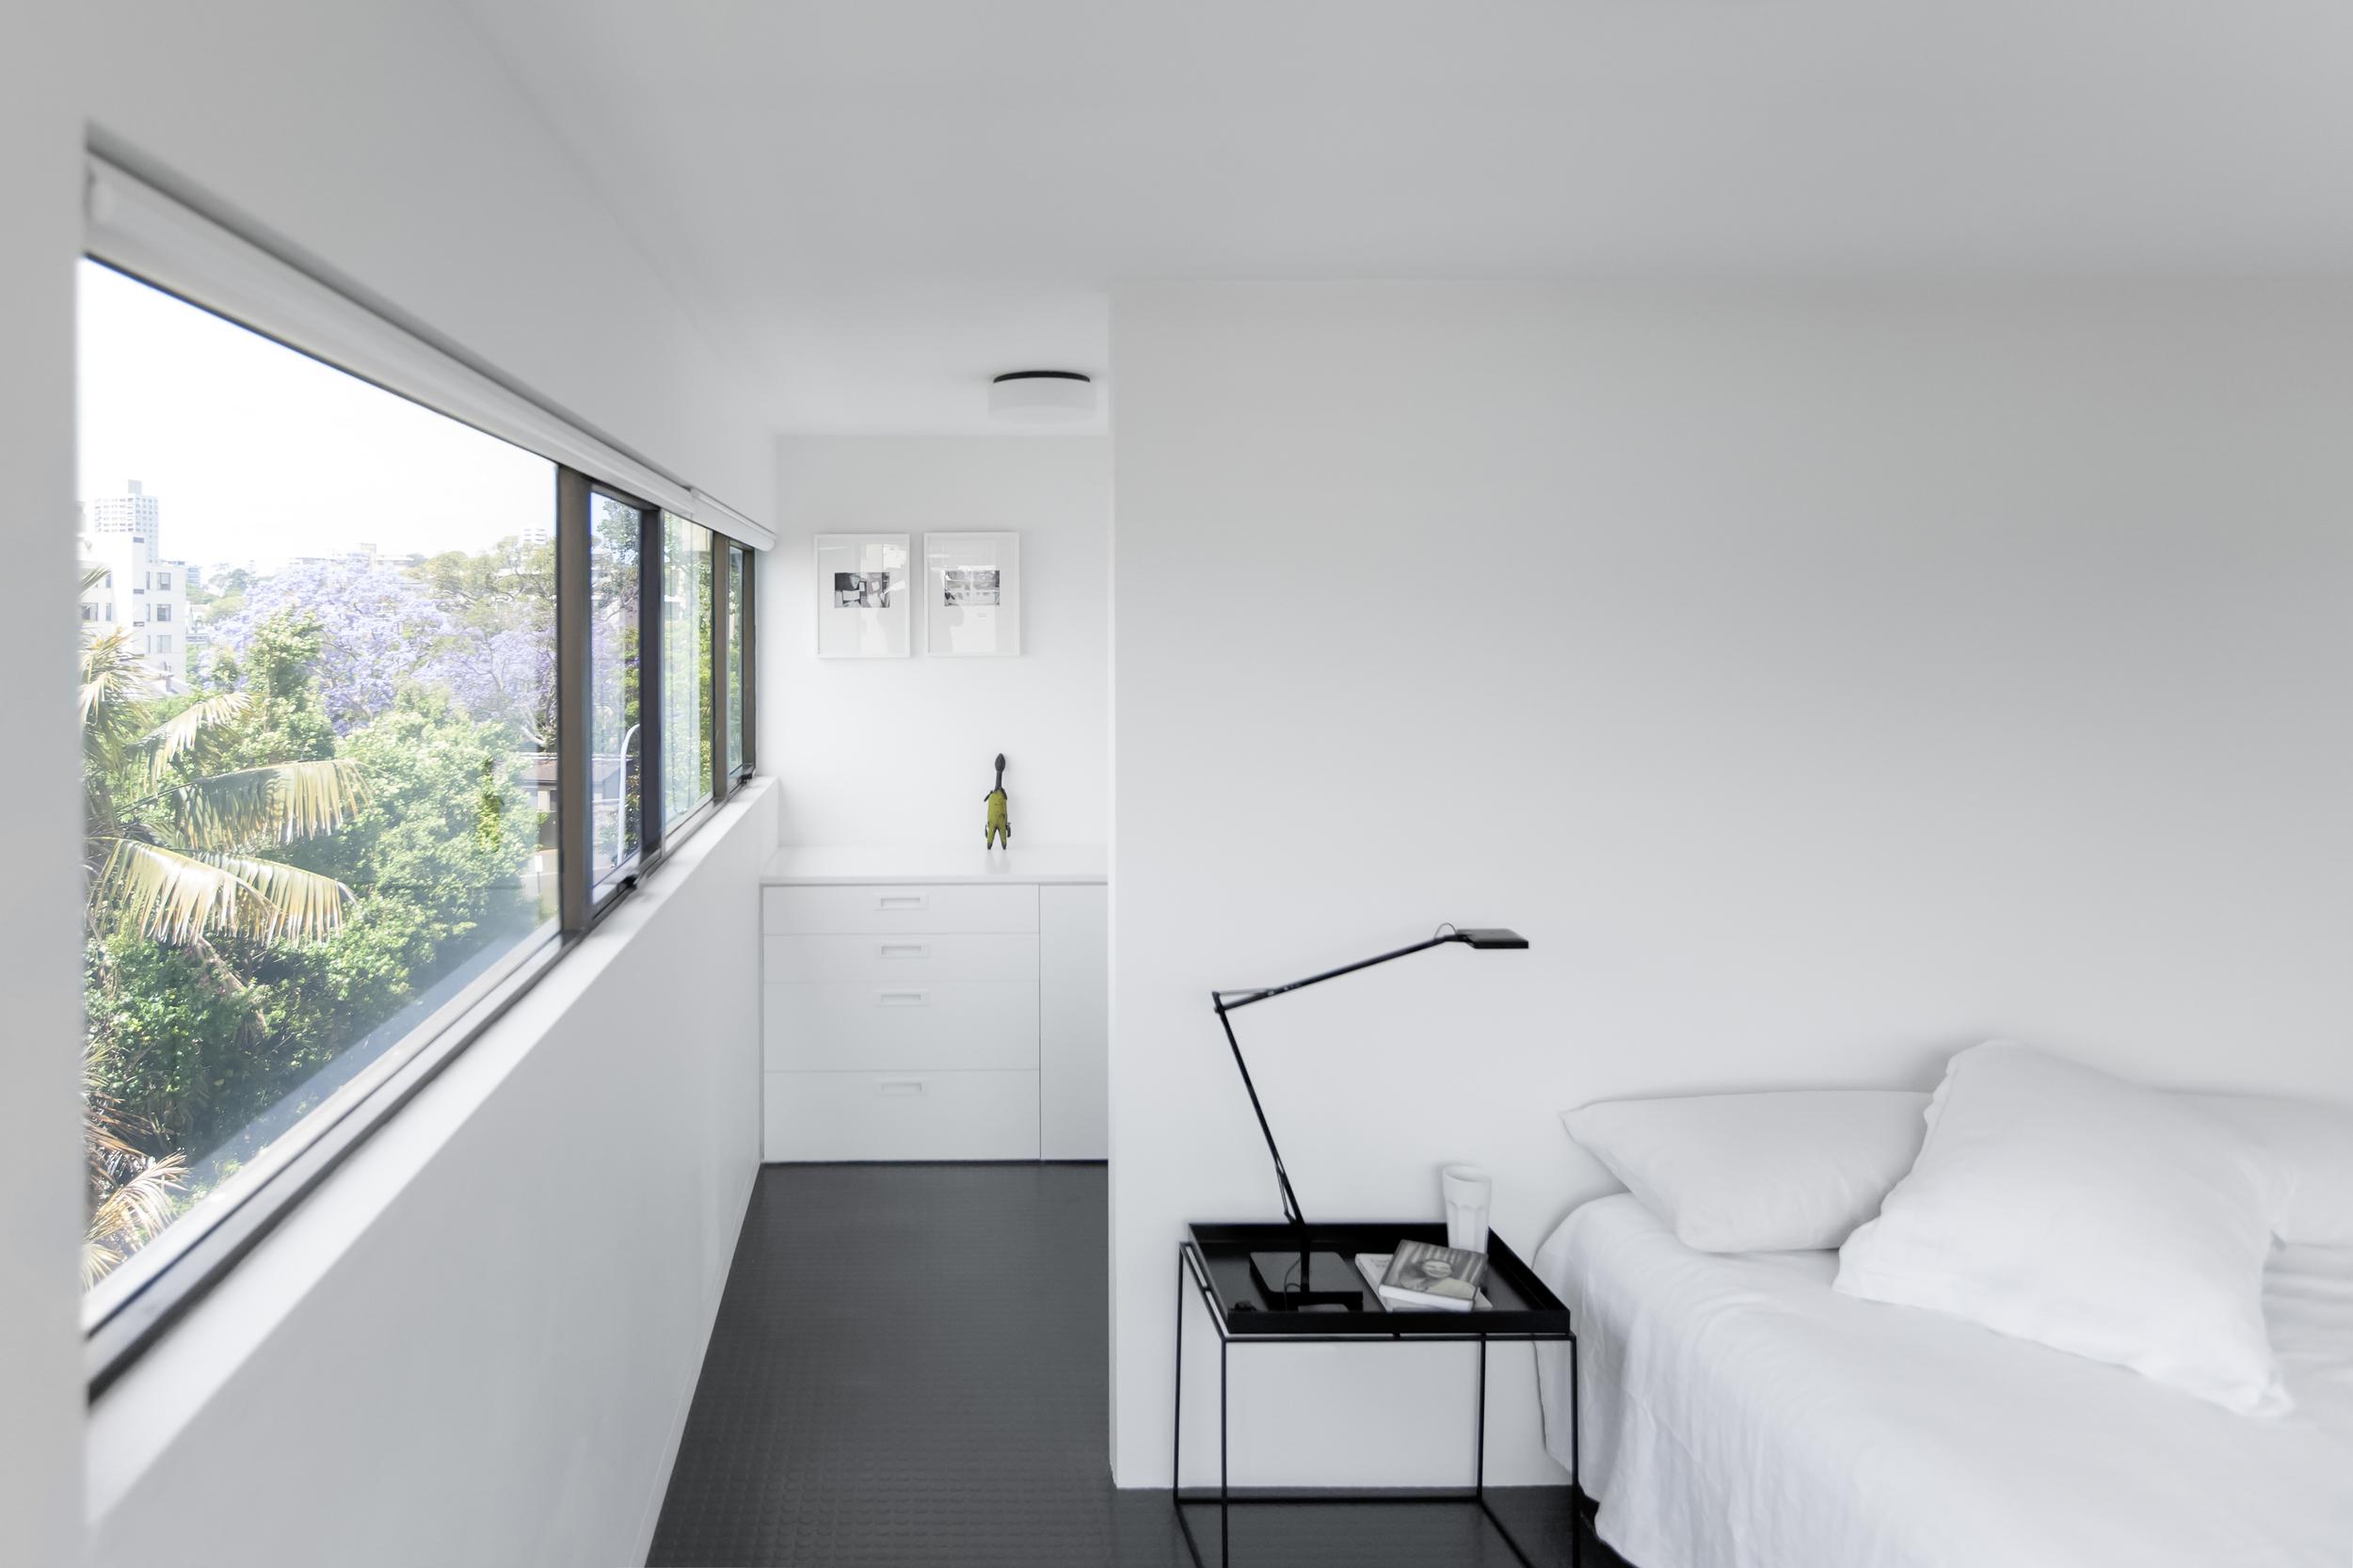 1412-InterLodge-HR-print-007-bedroom laundry.jpg